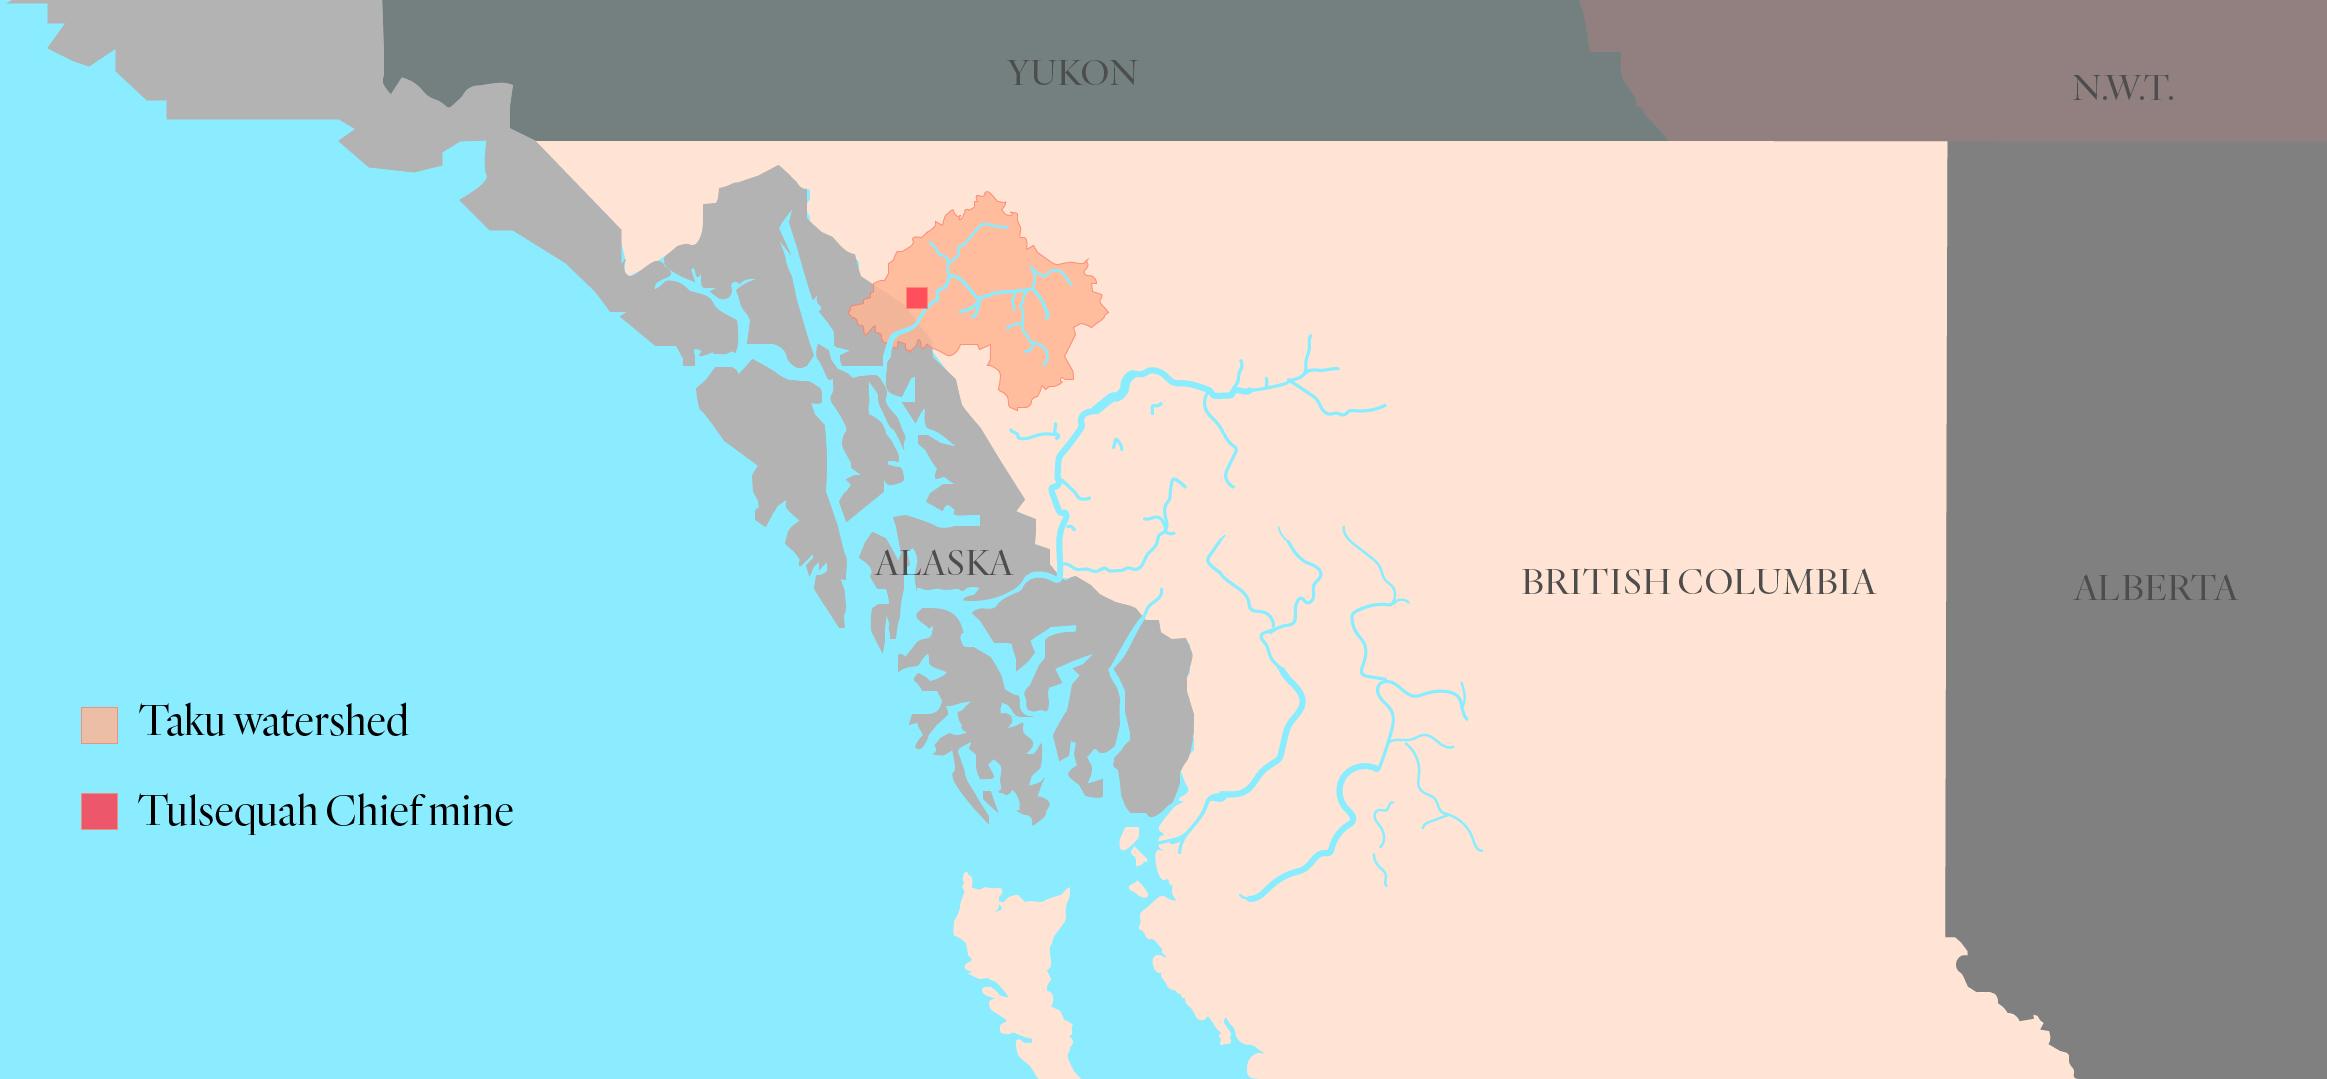 Tulsequah Chief mine map